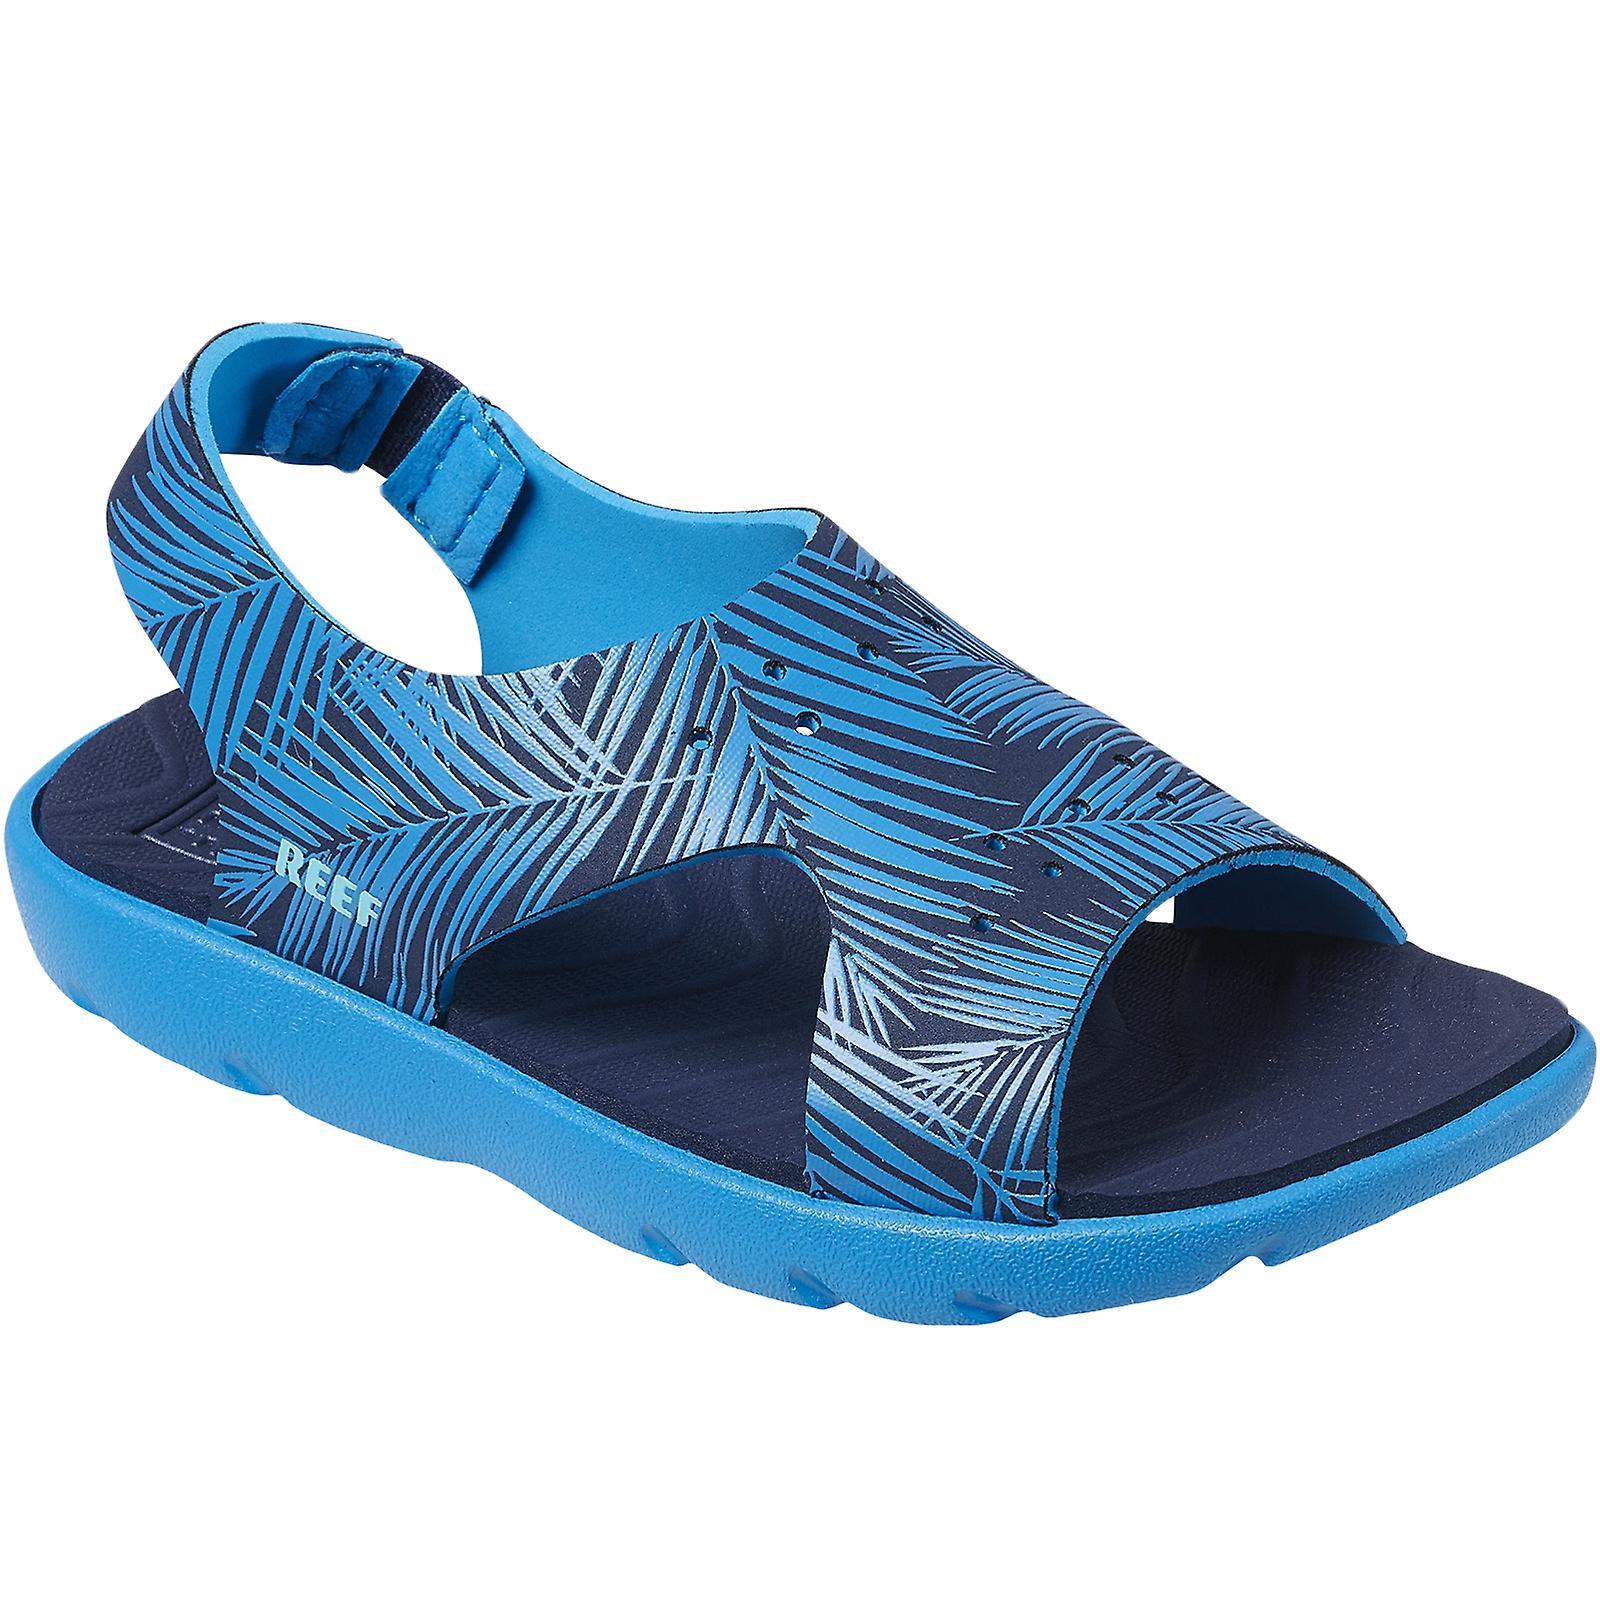 Reef Little Beachy Kids Boys Summer Beach Holiday Pool Flip Flops Sandals - Navy